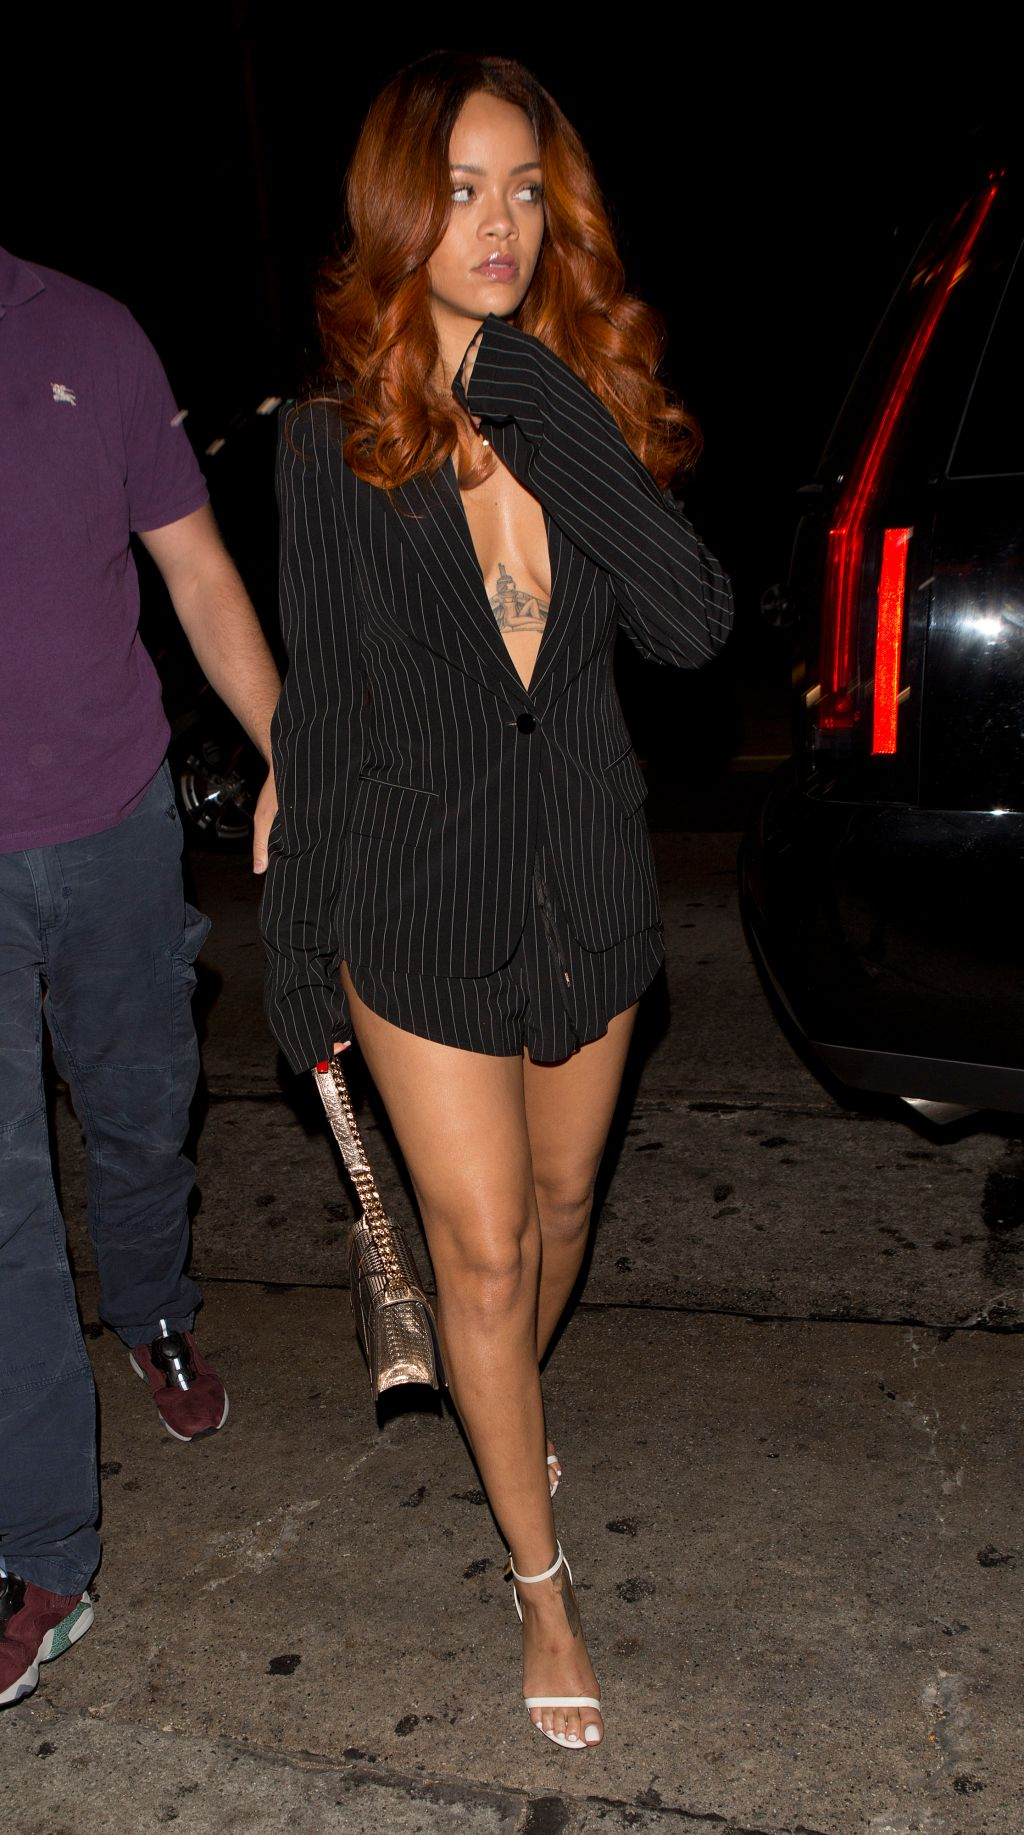 Rihanna seen arriving at the same nightclub Chris Brown is in